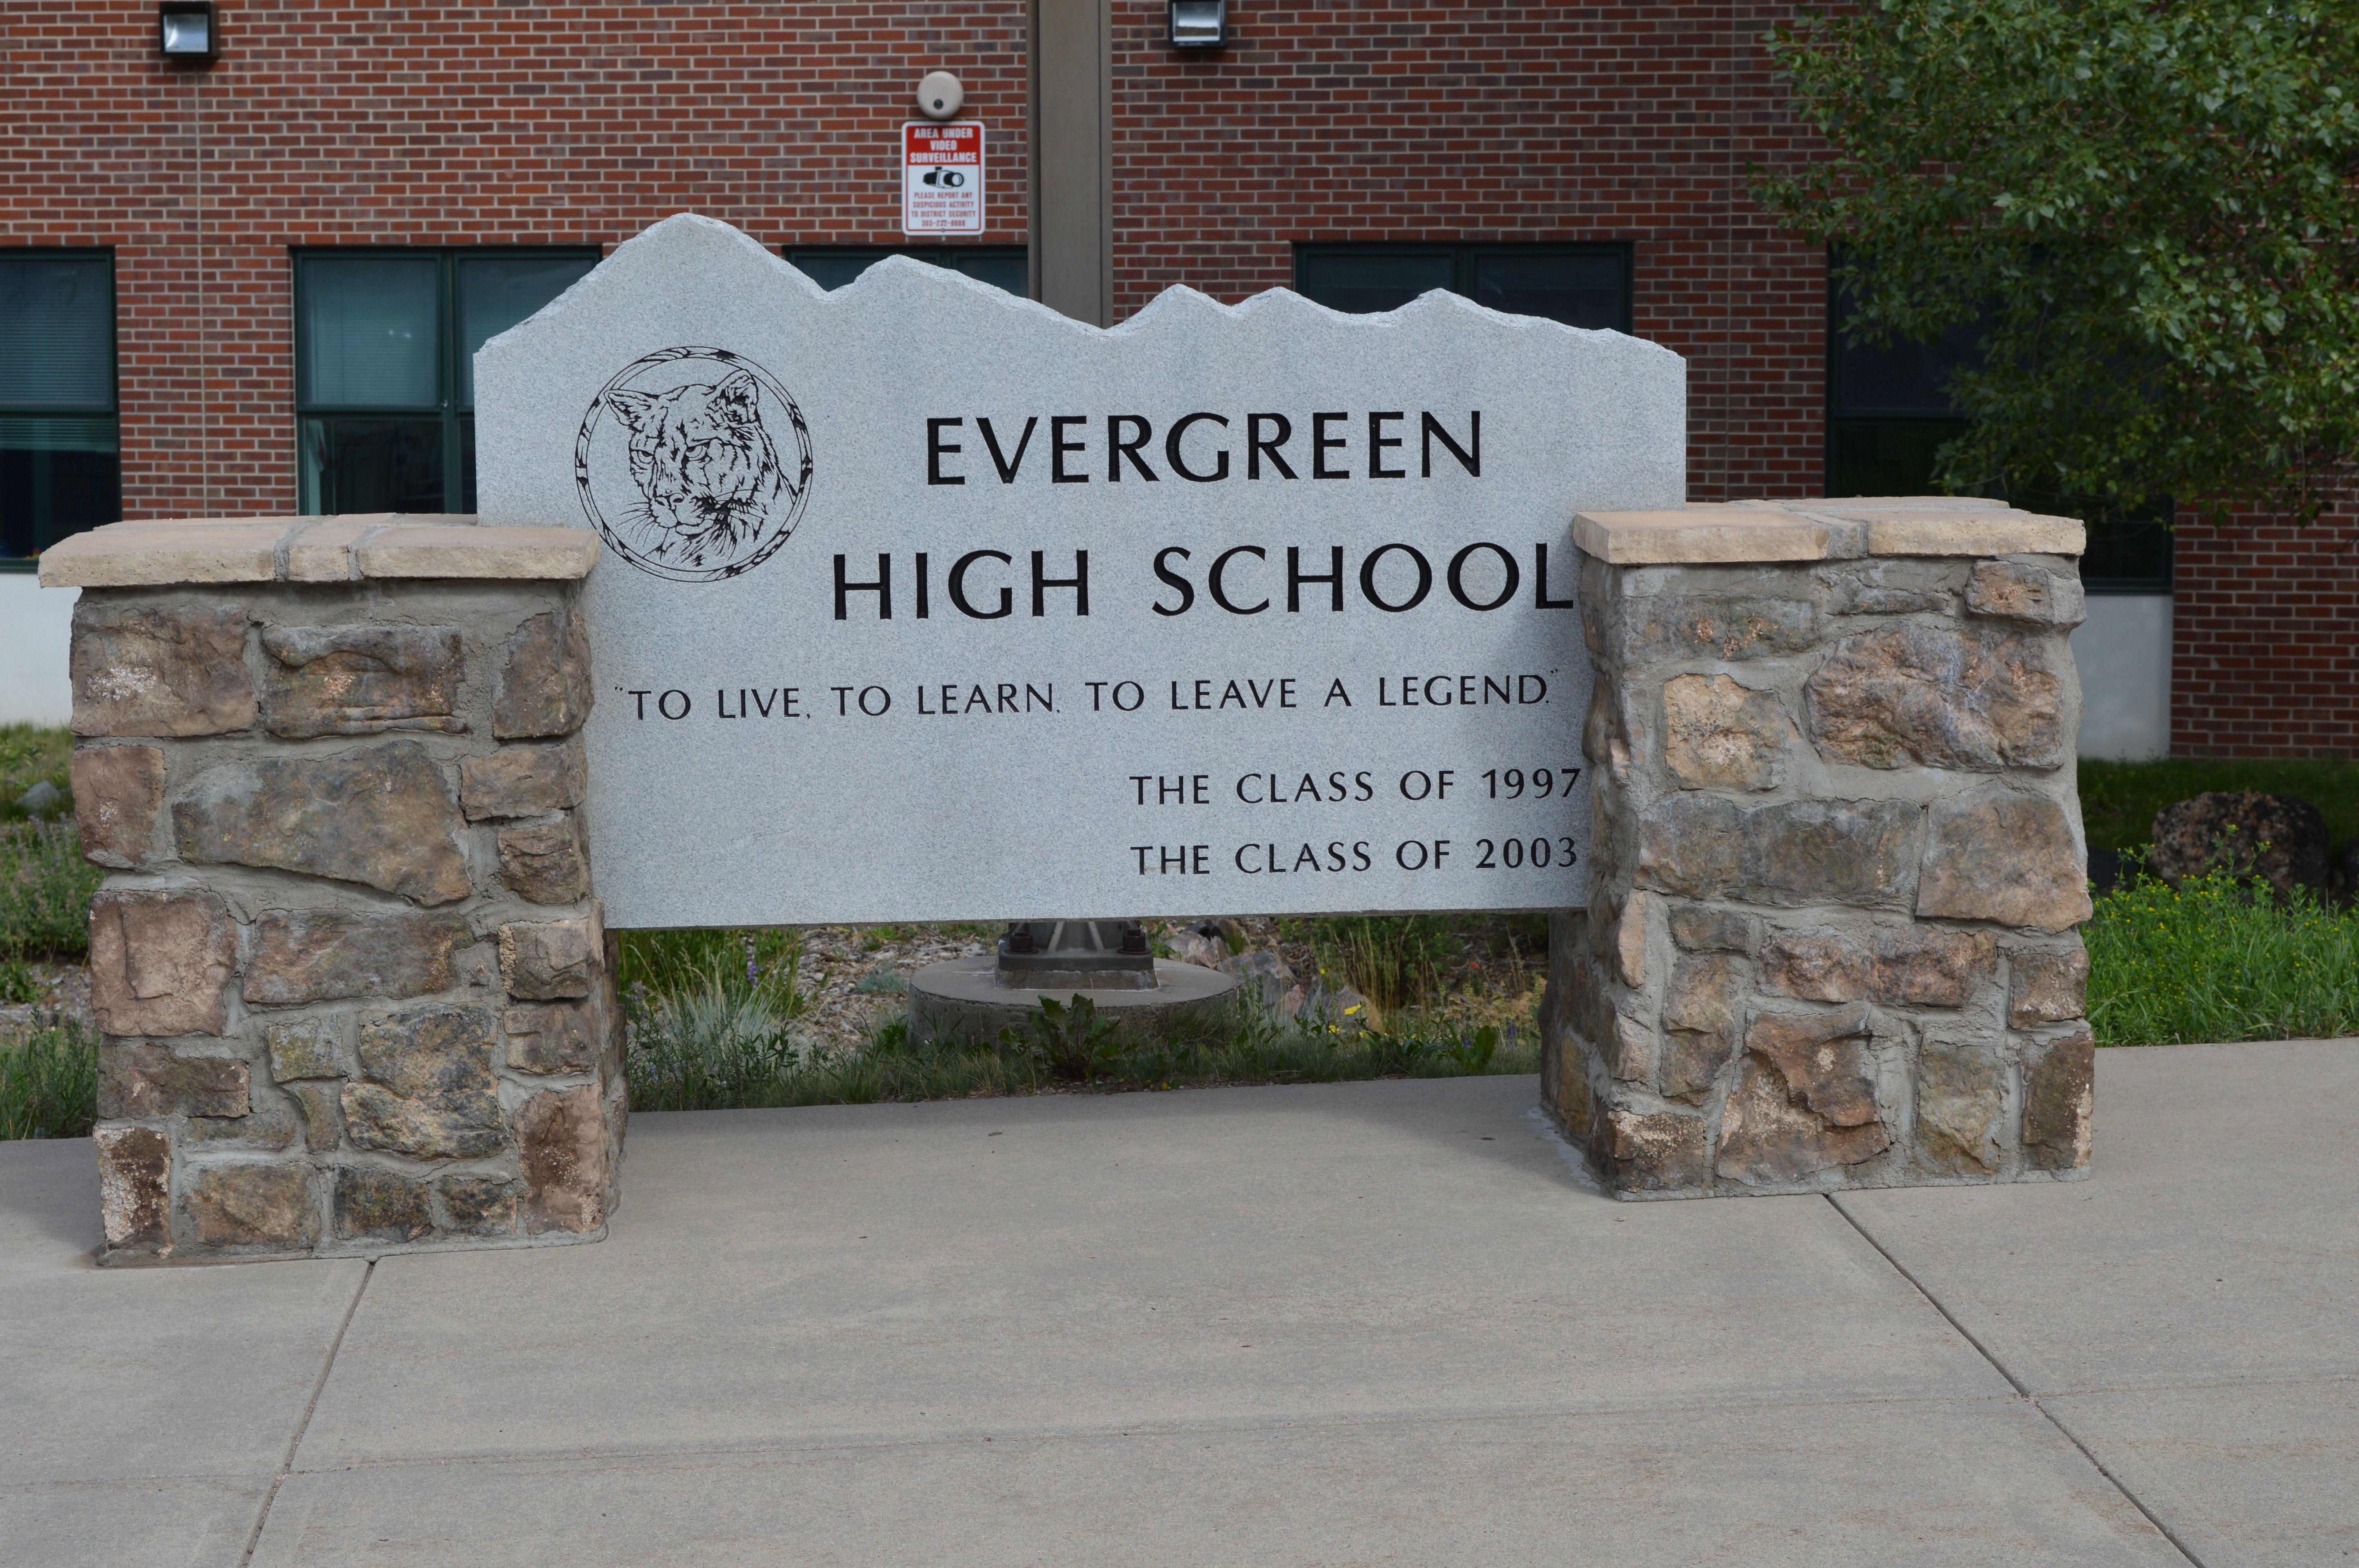 Evergreen High School Evergreen Colorado Evergreen